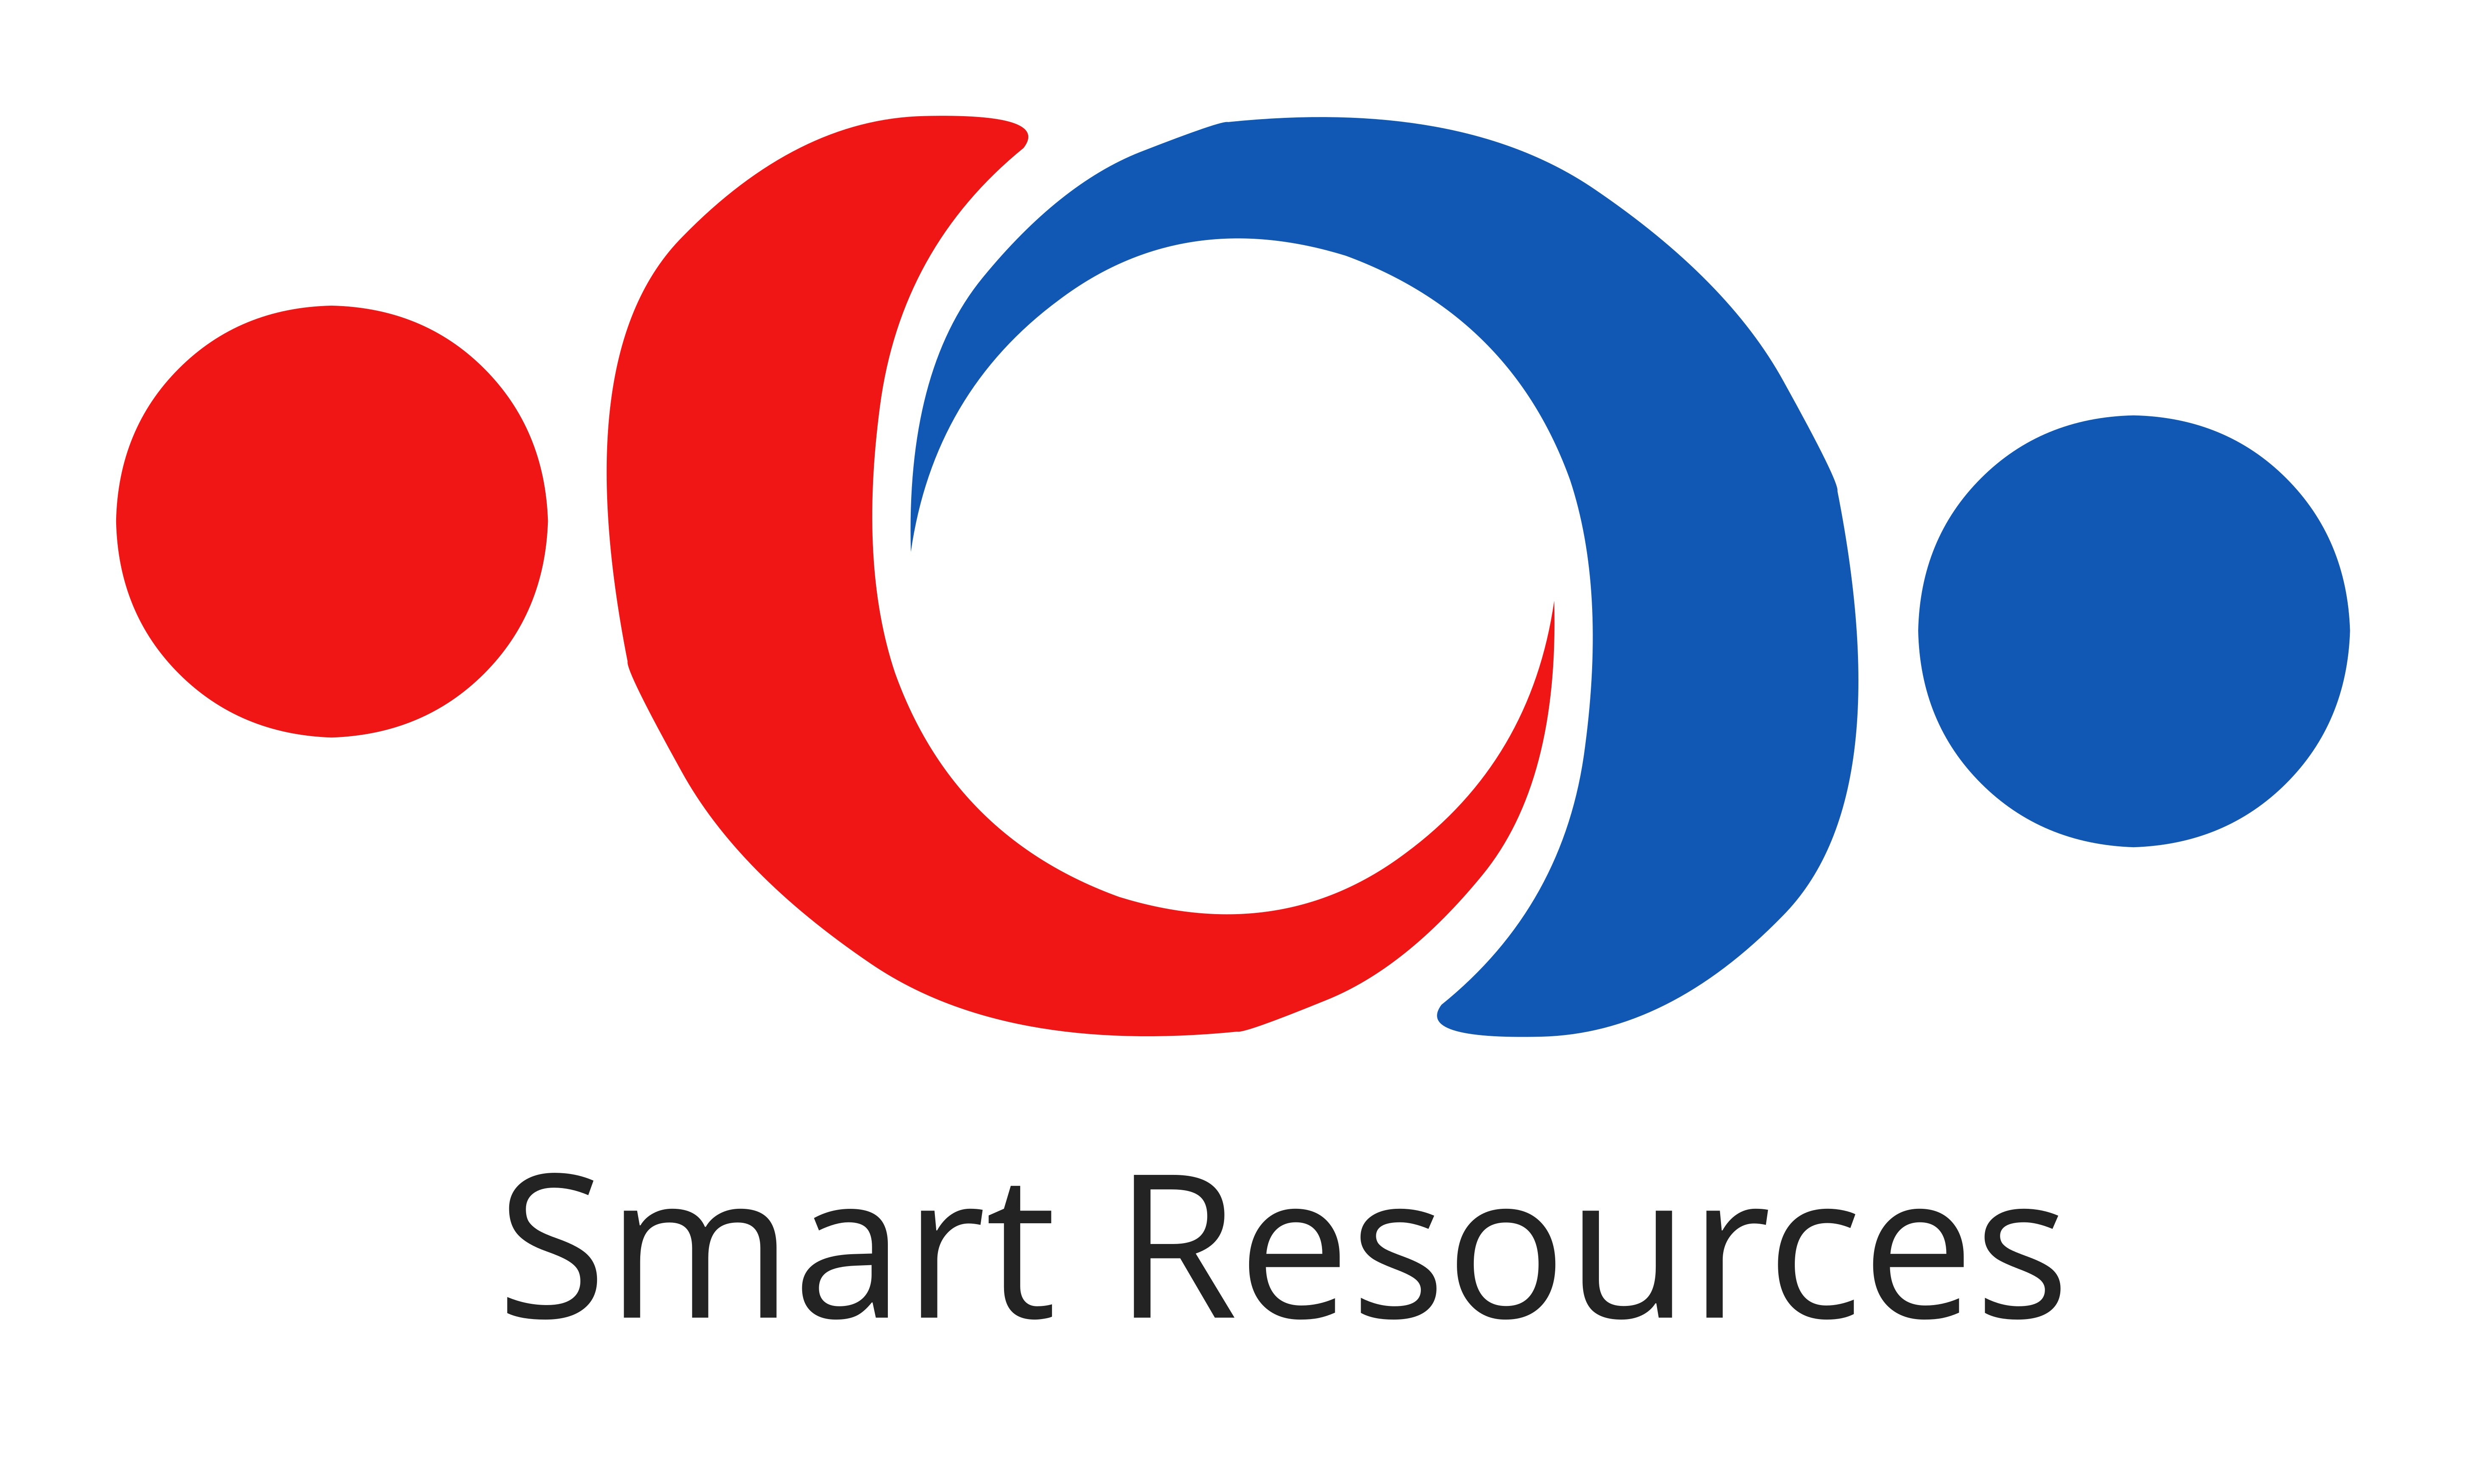 Smart Resources